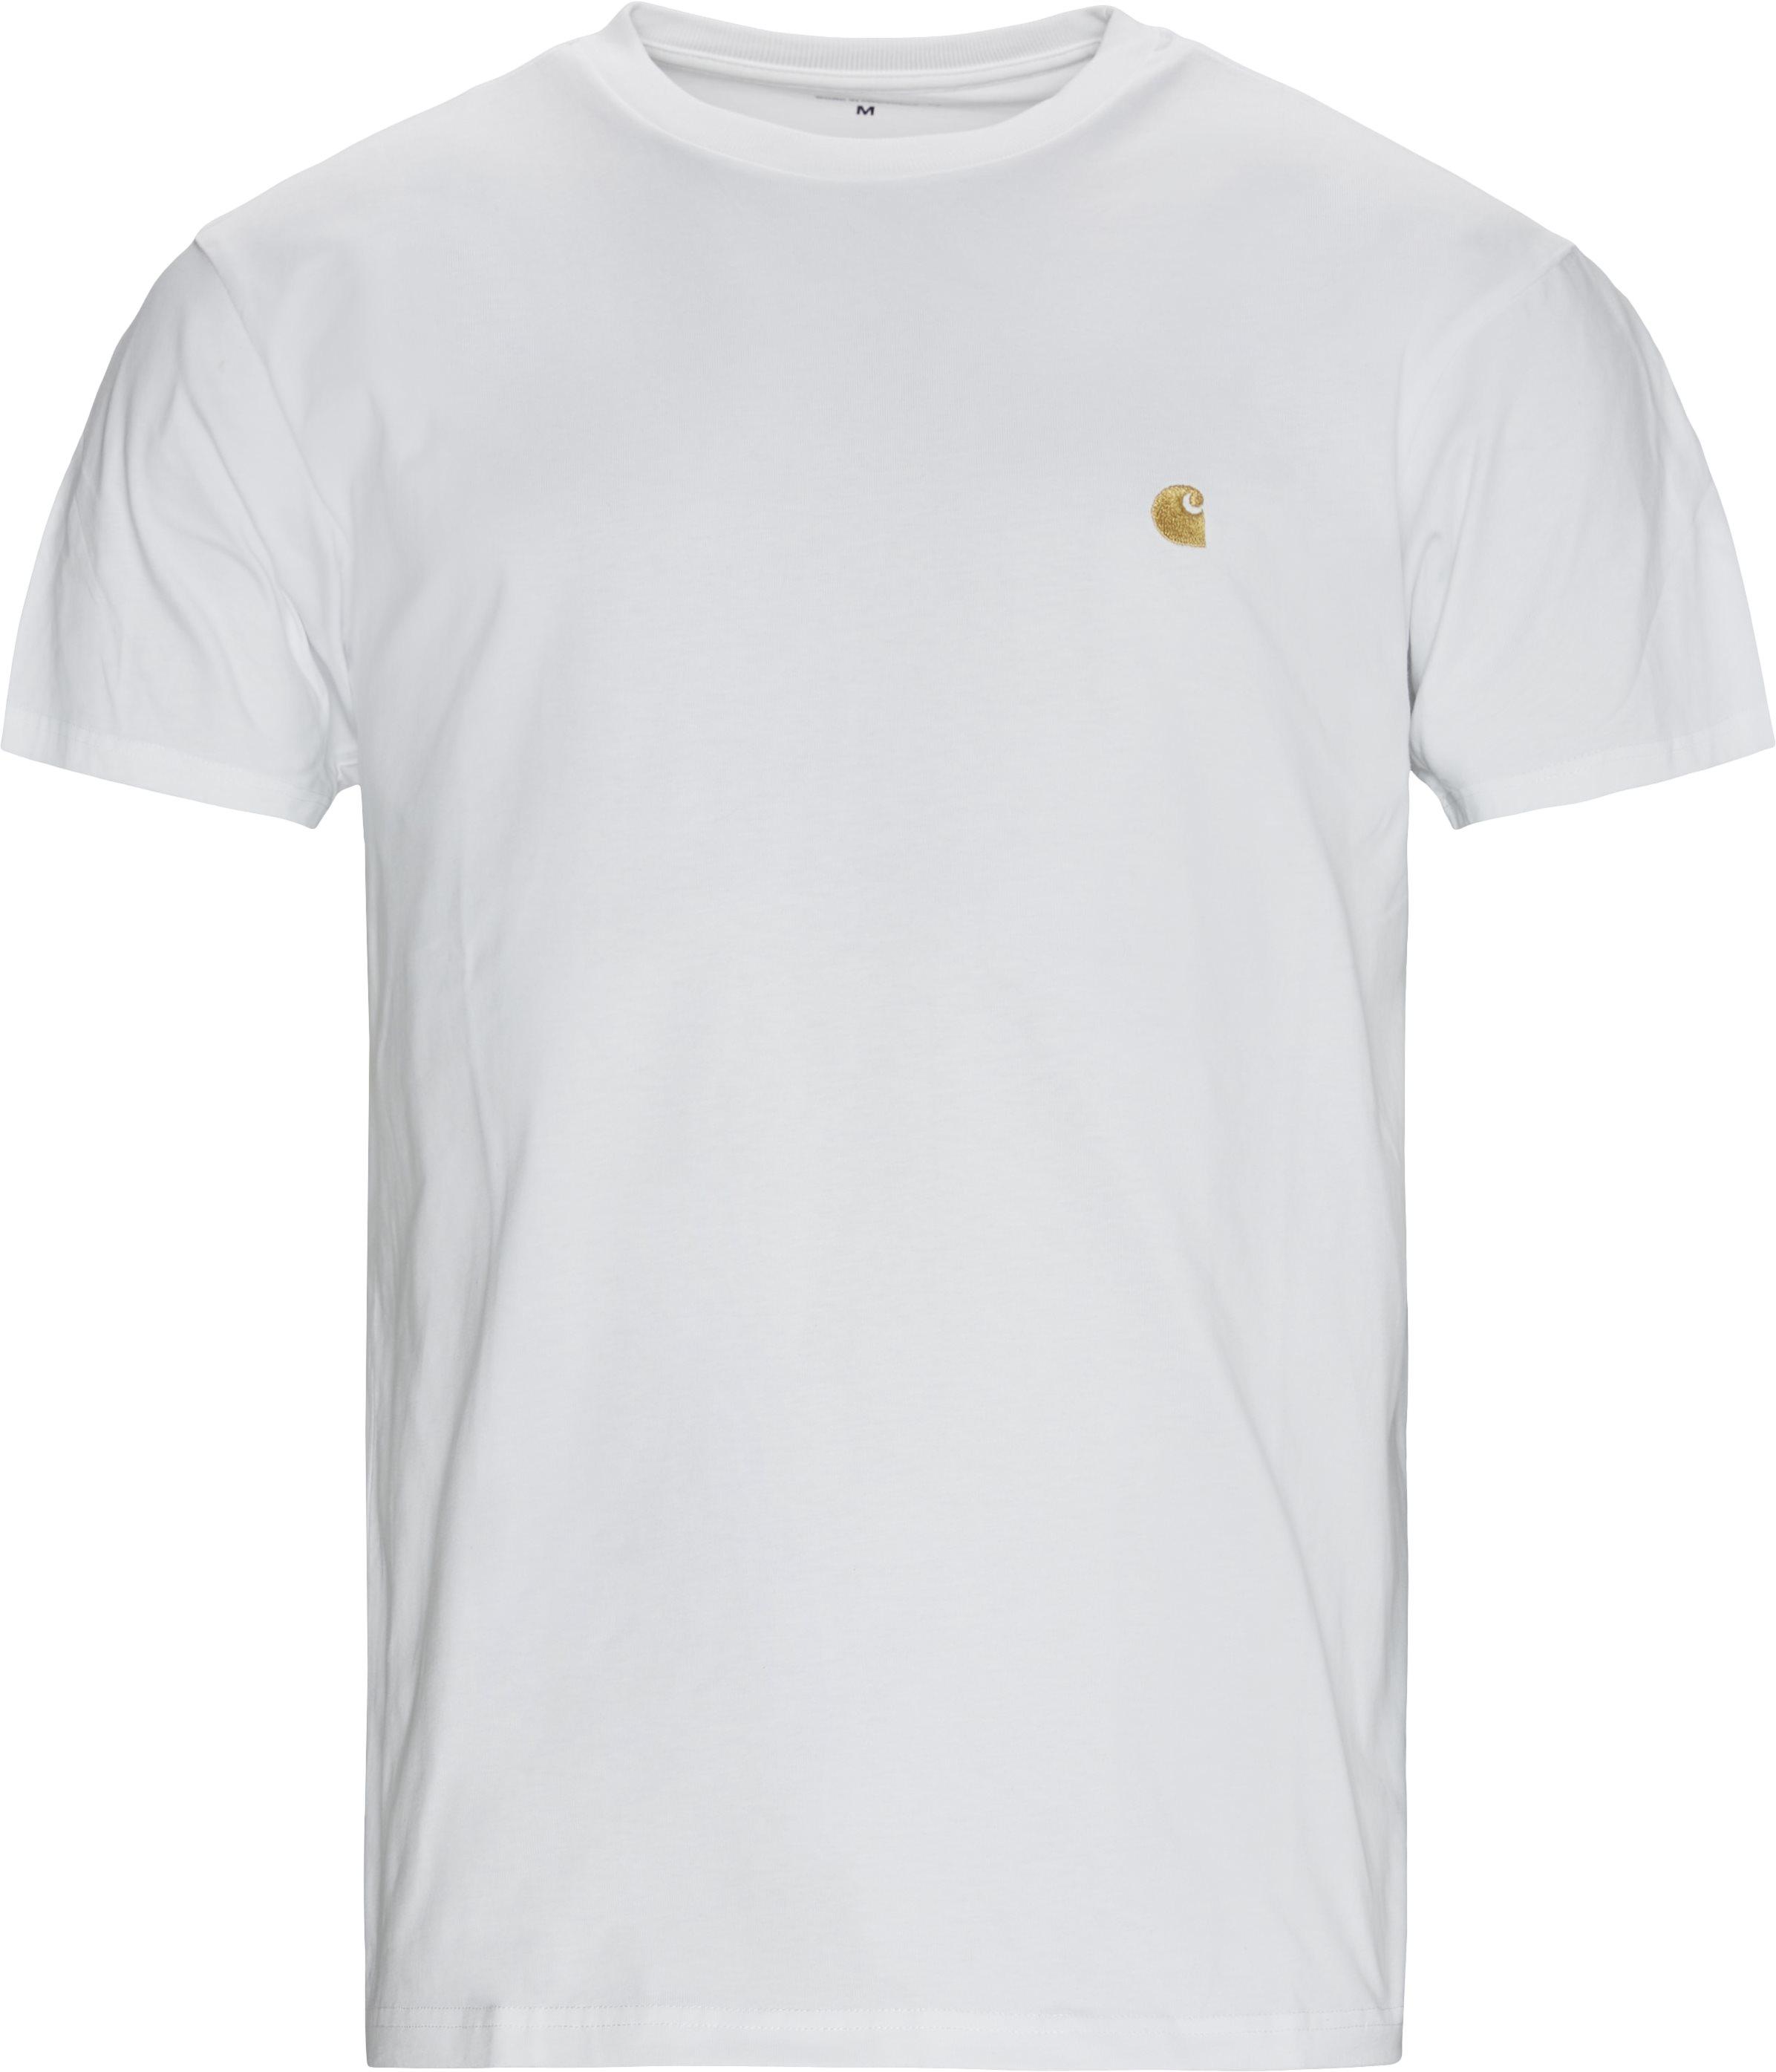 Chase Tee - T-shirts - Regular - Vit